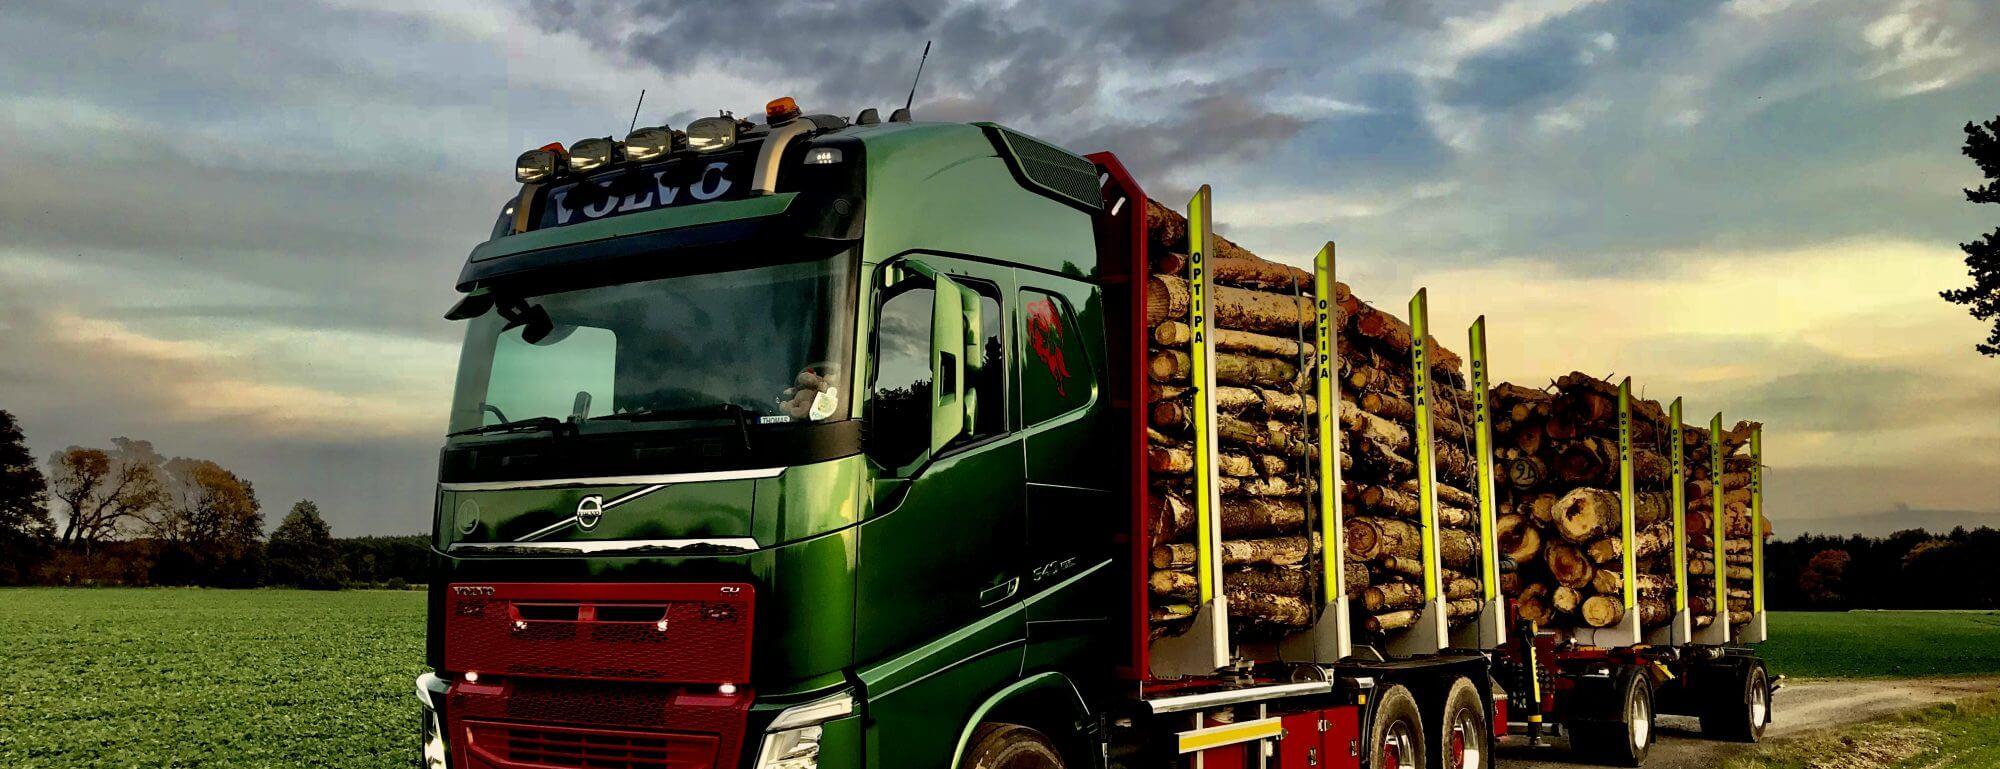 LKW Pavic | Holztransporter Forst Kran Kipper Baustoff